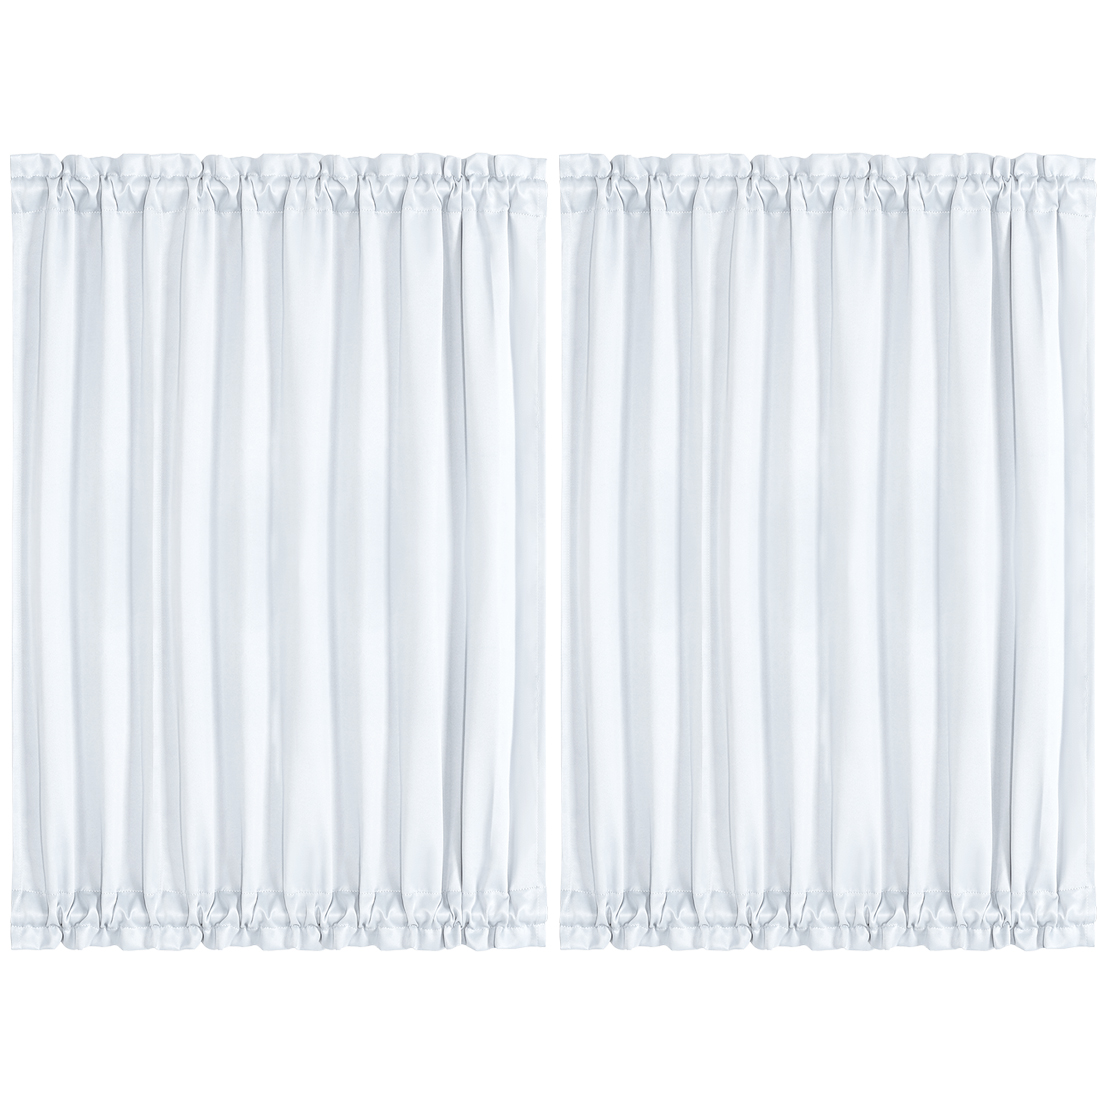 "2pcs Blackout Curtain Sliding Door Panel Darkening Drape Greyish White 54"" x 72"""